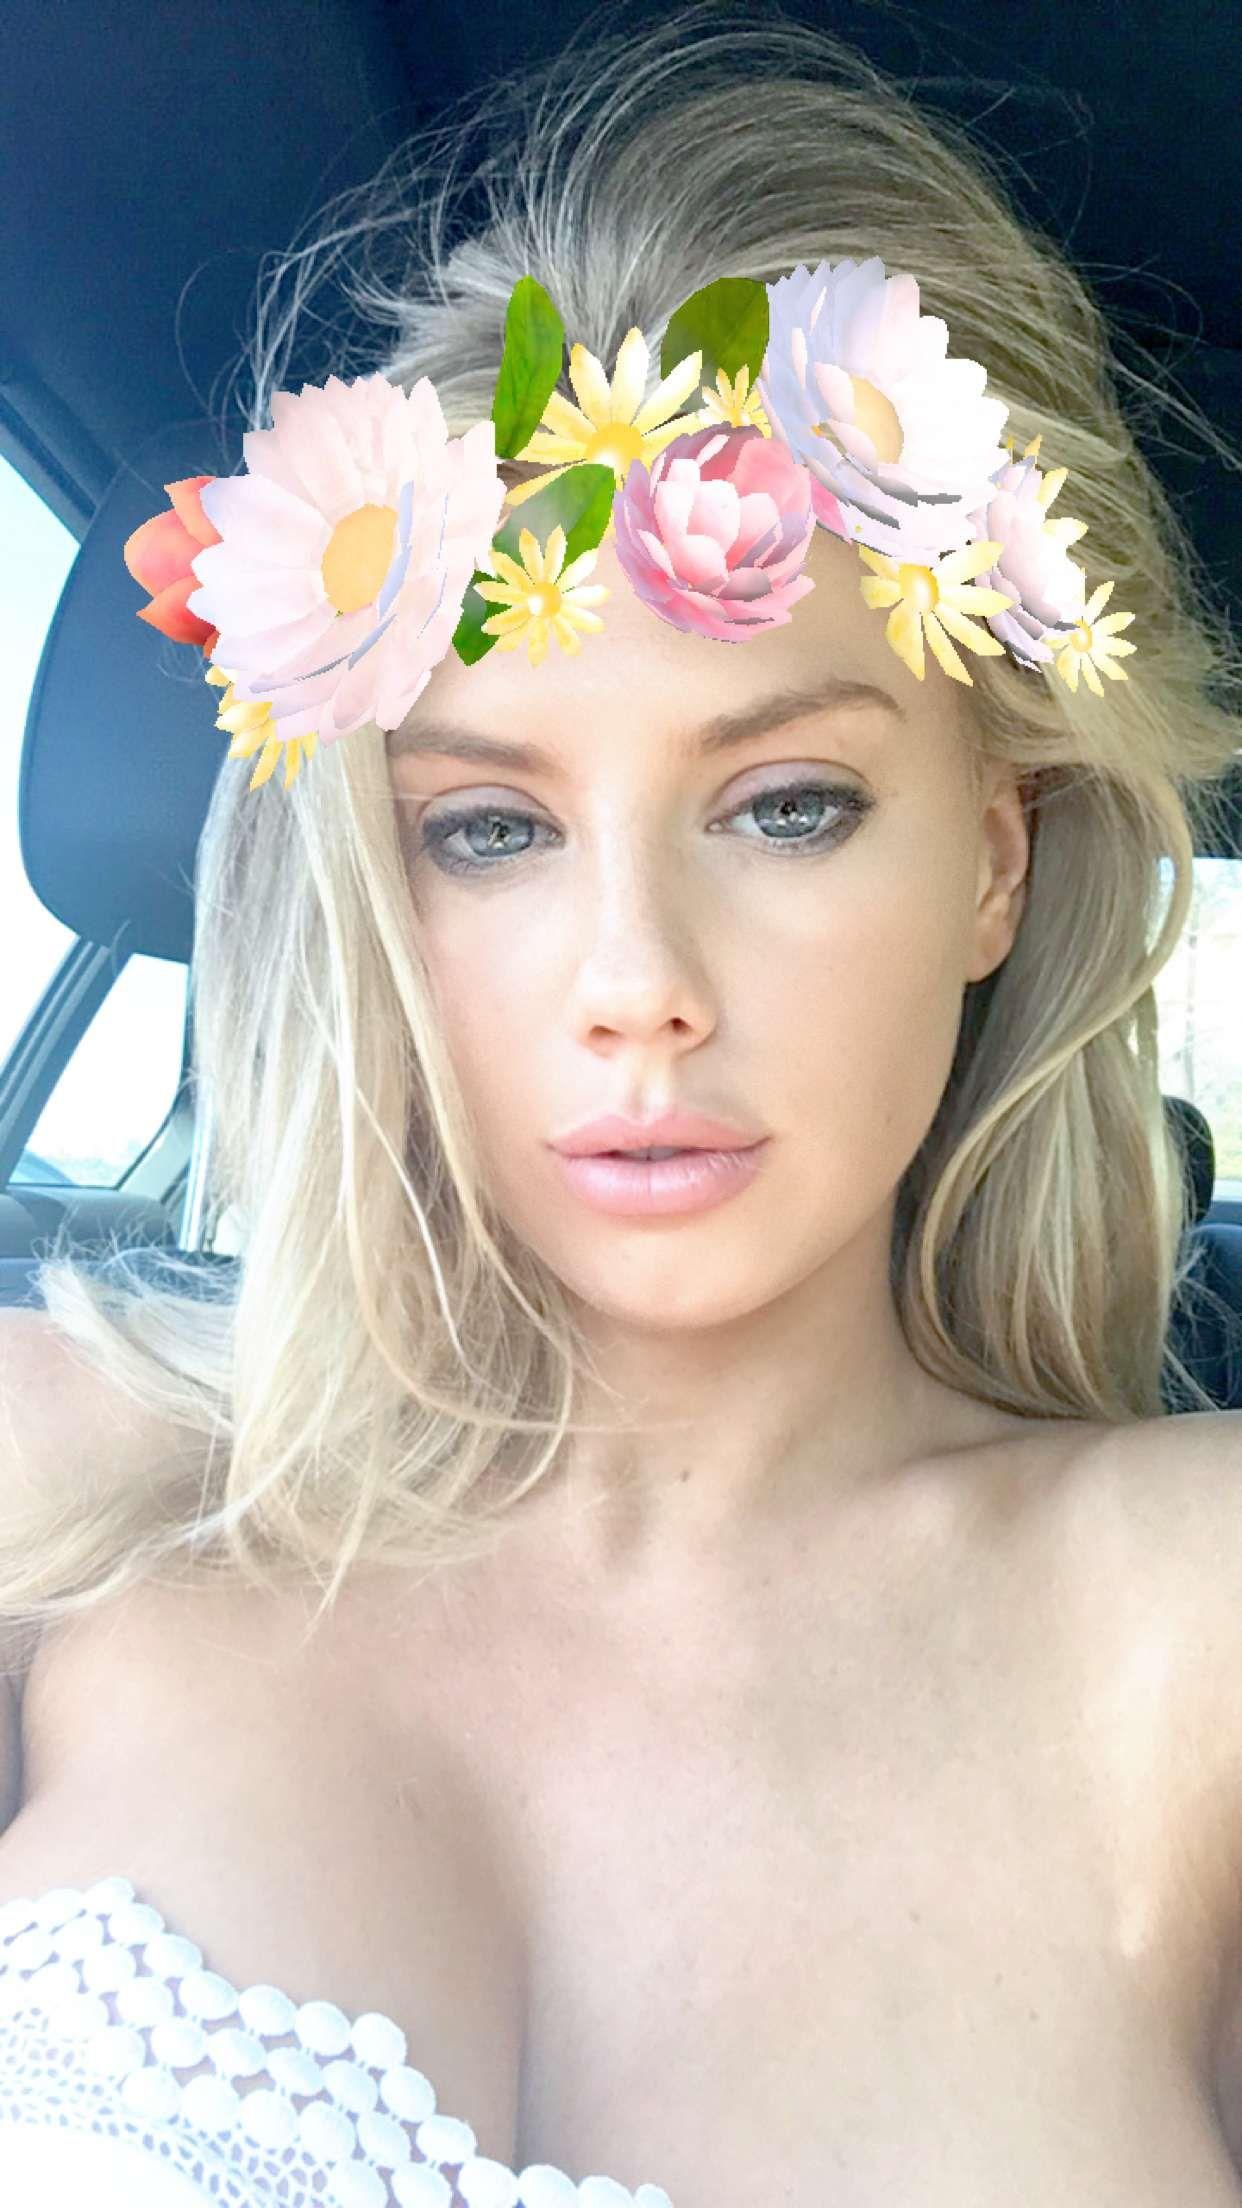 Charlotte-McKinney-Selfies-2